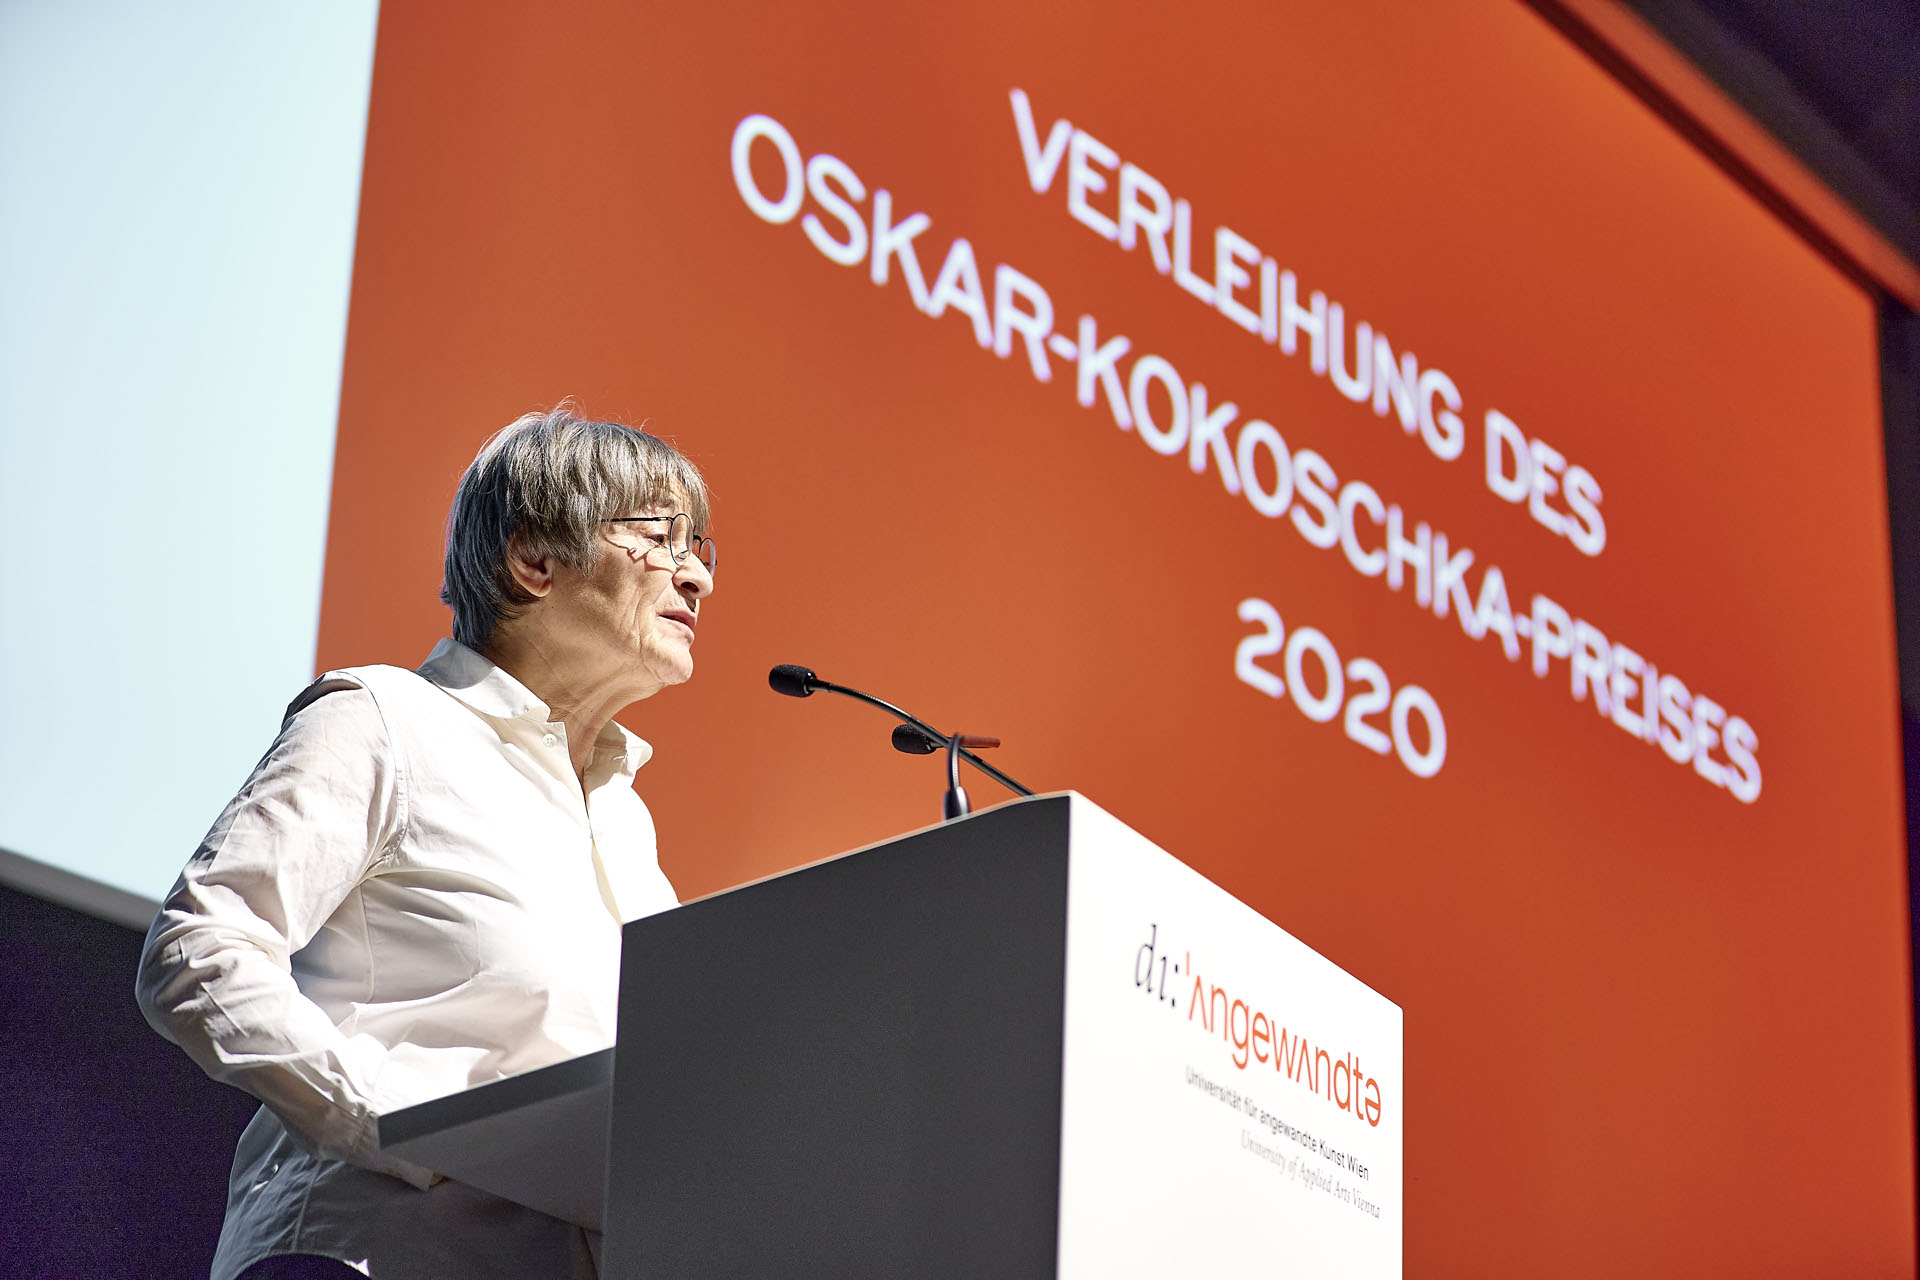 Oskar-Kokoschka-Preisverleihung 2020Monica Bonvicini